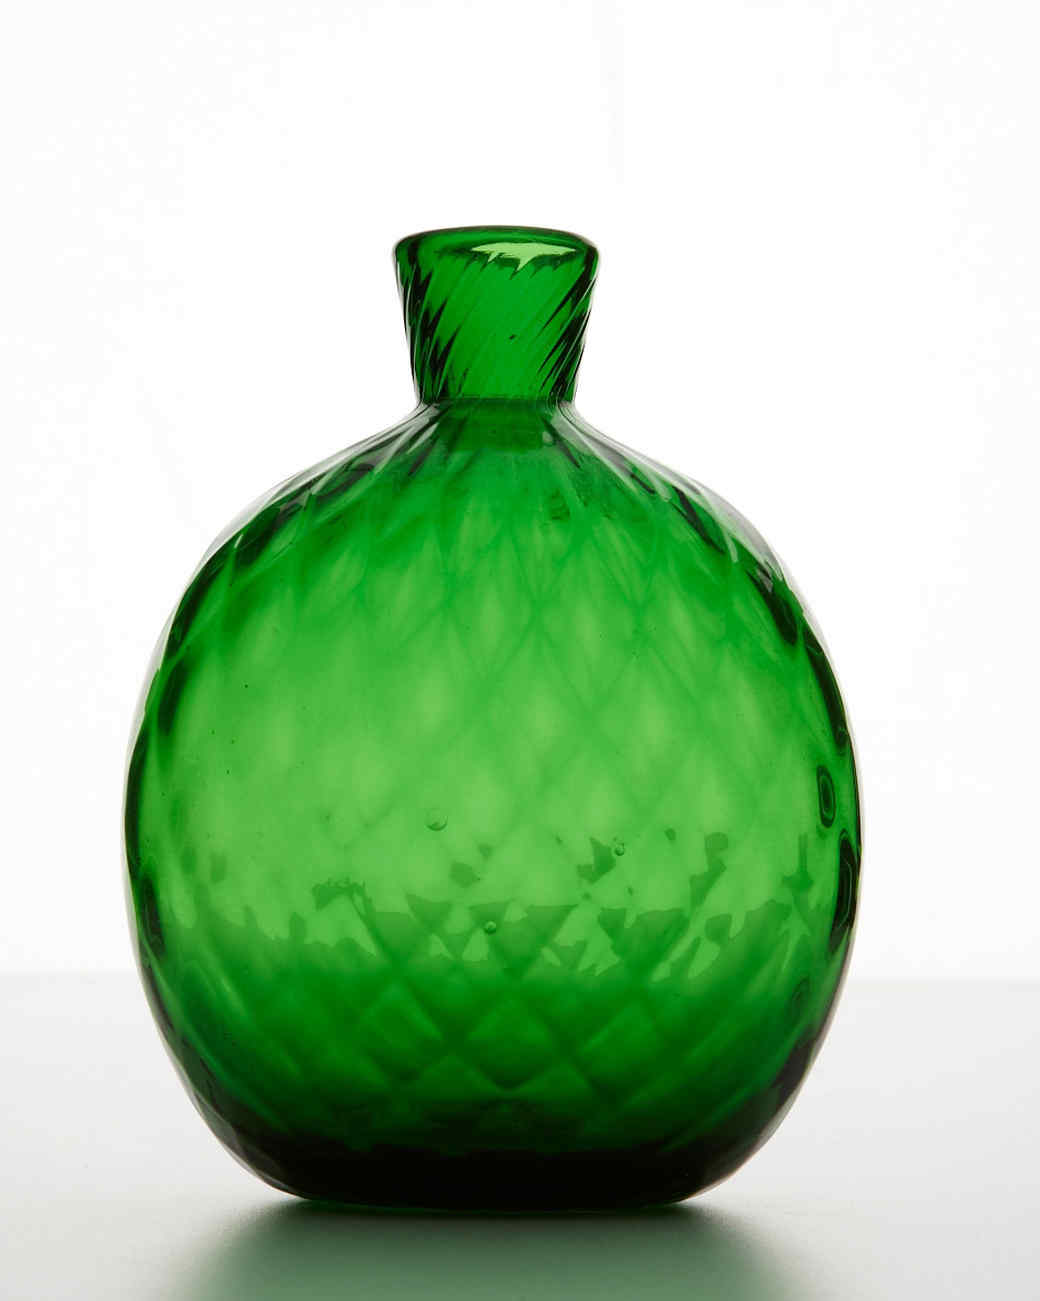 Collecting Bottles and Jars – Temple Illuminatus